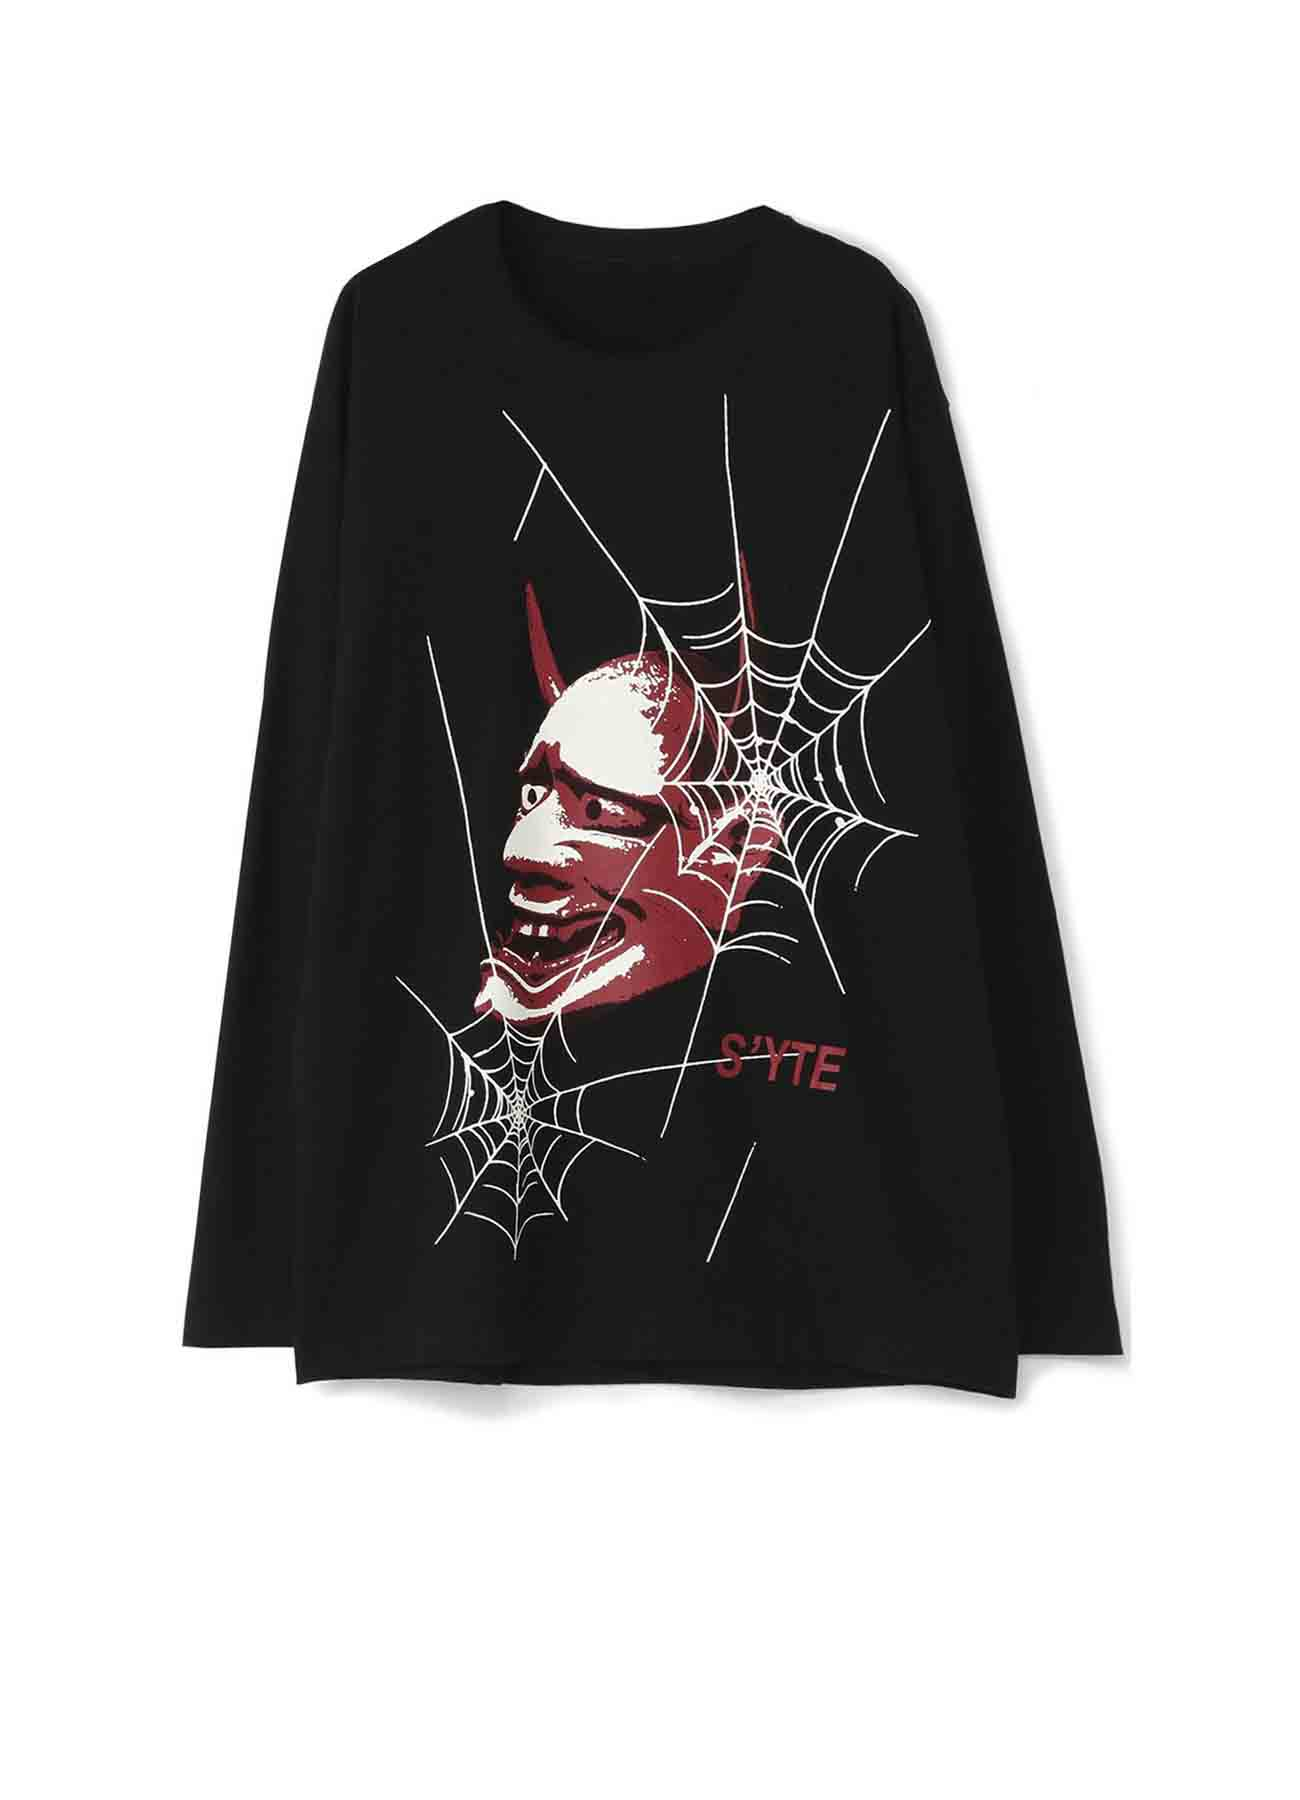 20/CottonJersey Mask of Hannya SpiderWeb Long Sleeve T-Shirt